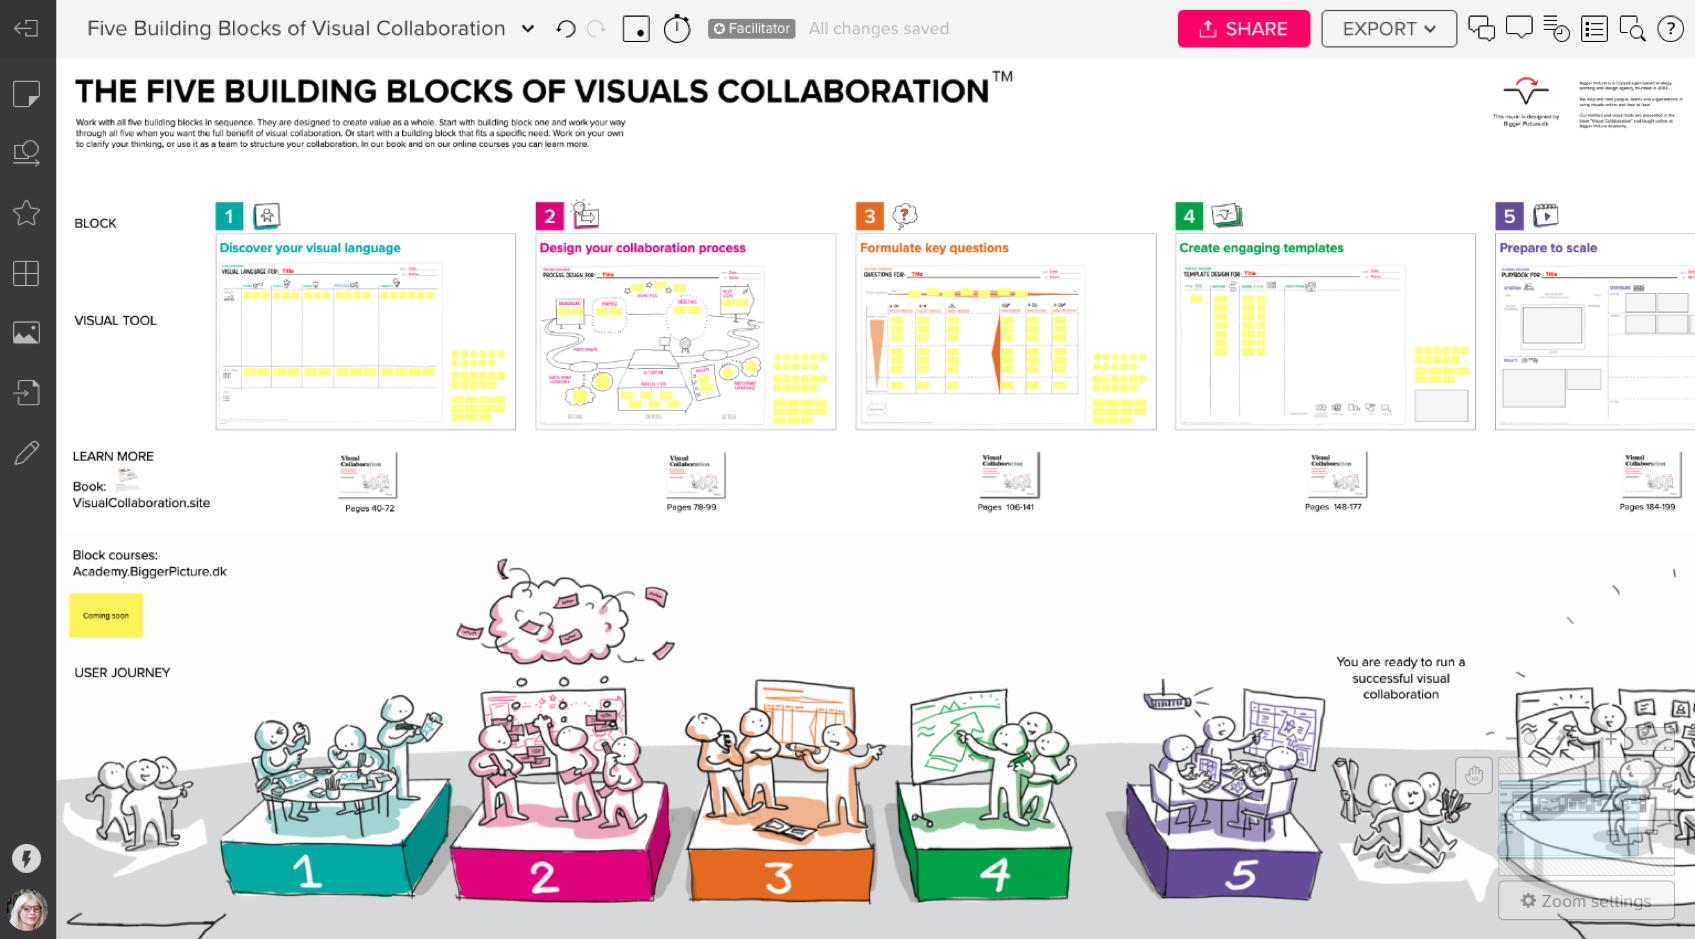 Five Building Blocks of Visual Collaboration